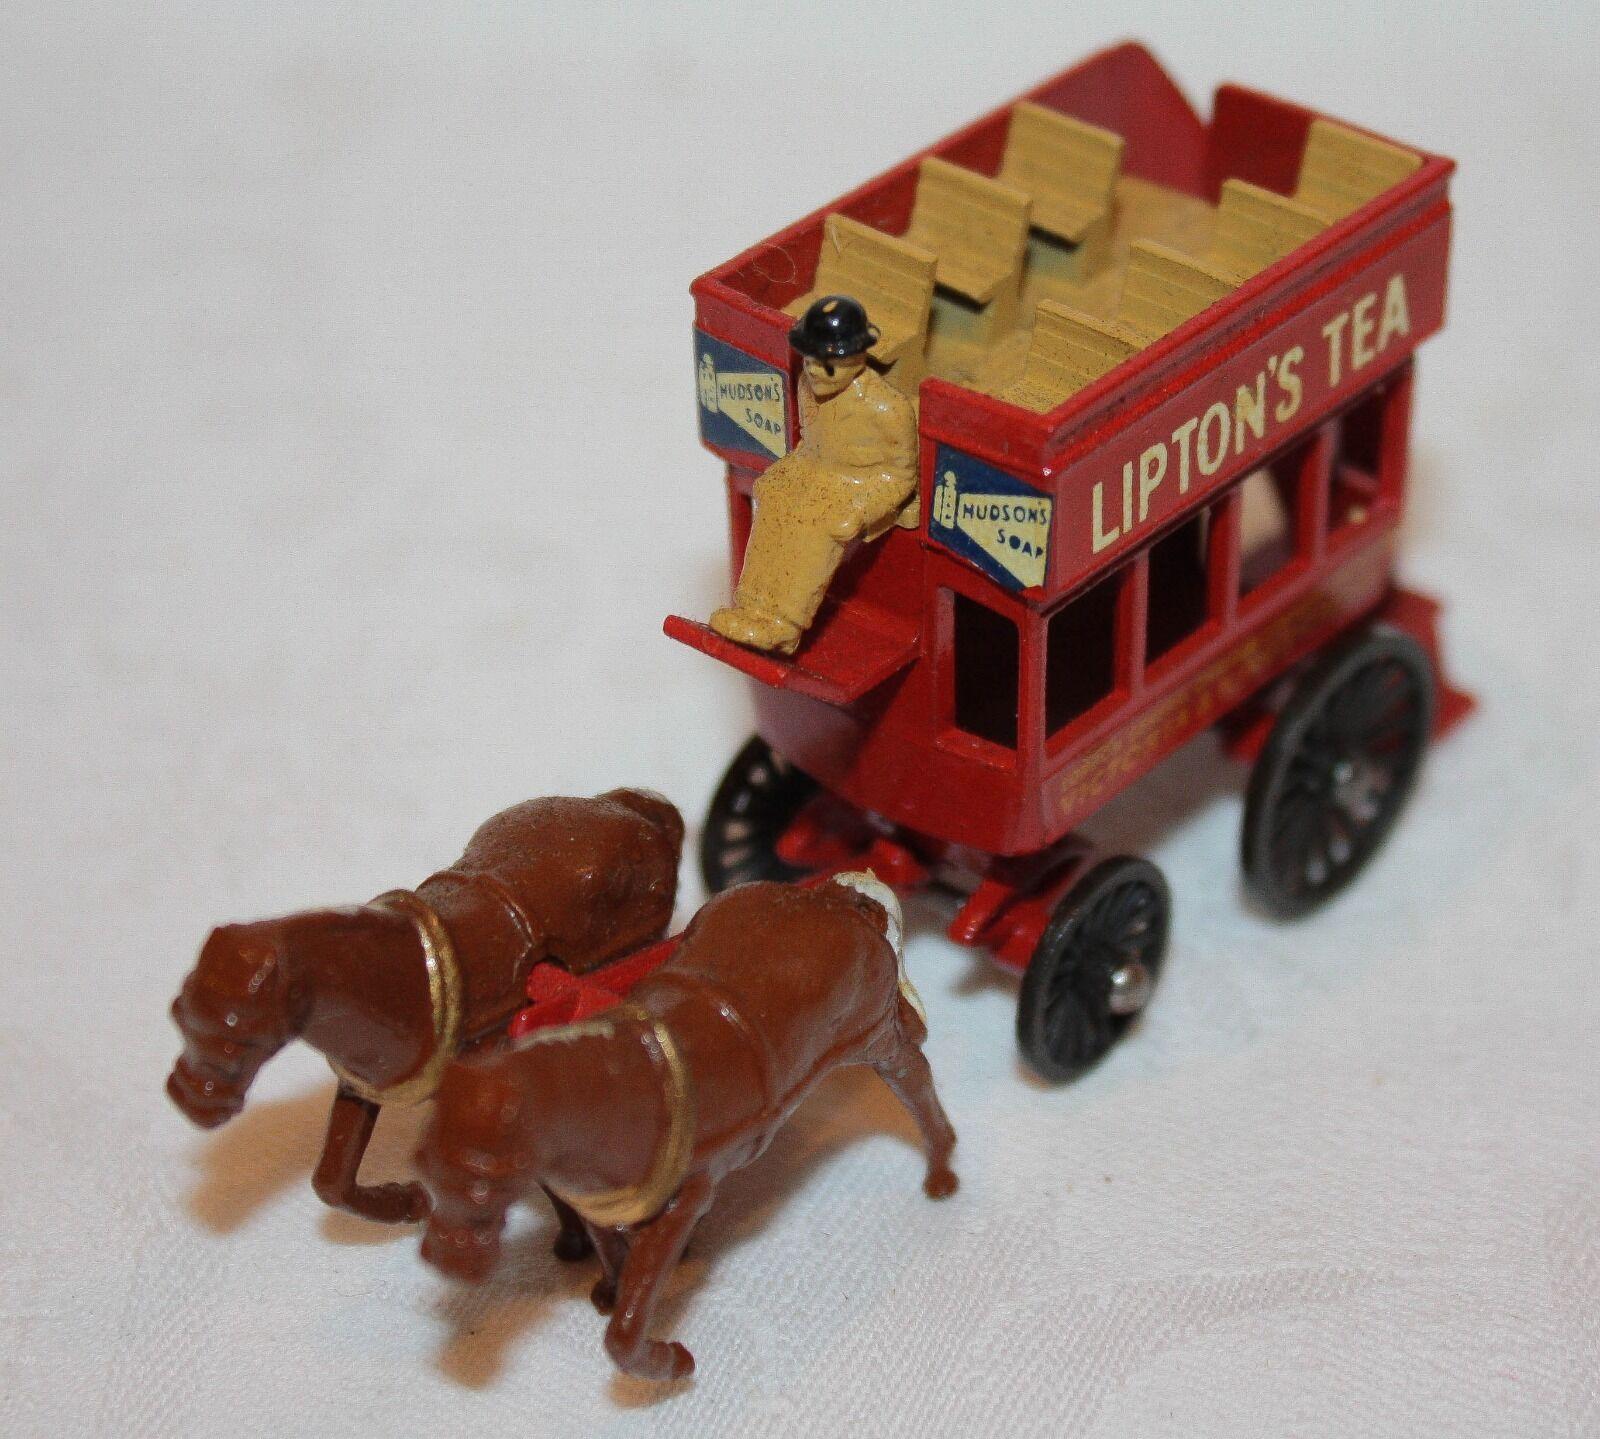 Vintage Matchbox Lesney Models of Yesteryear Y12-1 1899 London Horse Drawn Bus